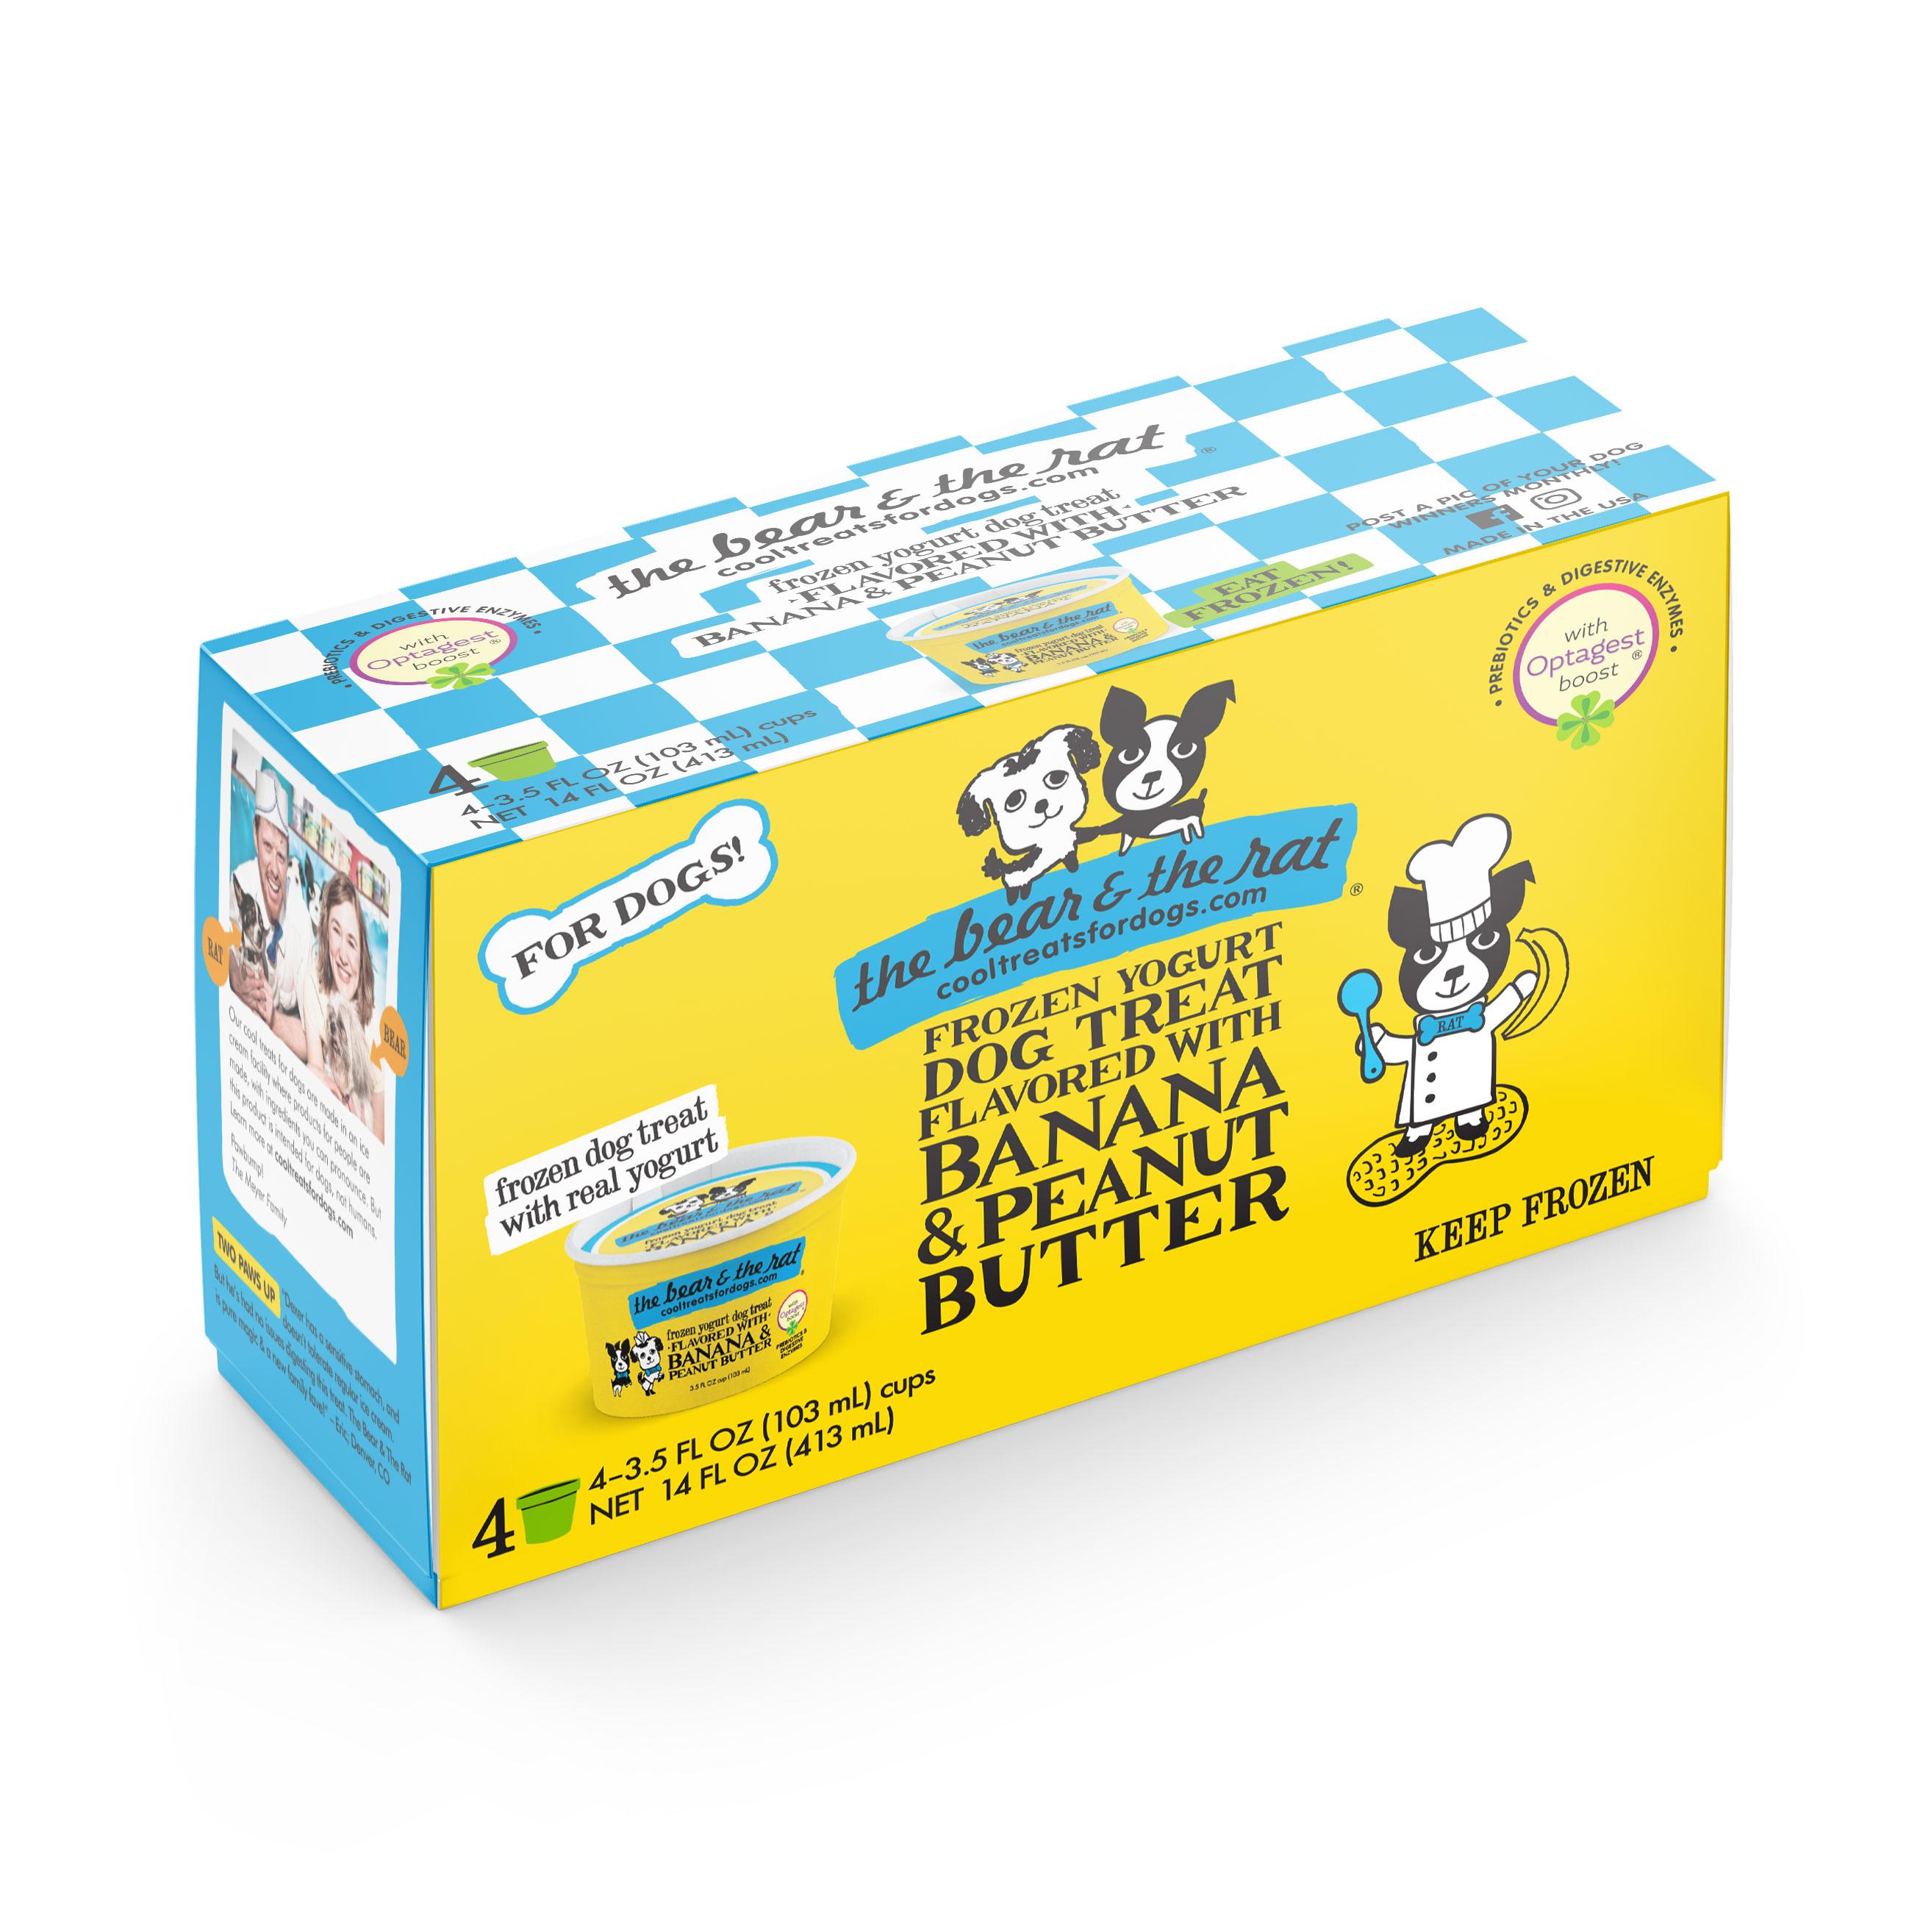 The Bear & The Rat Banana & Peanut Butter Frozen Yogurt Dog Treats, 3.5-oz, 4-pack